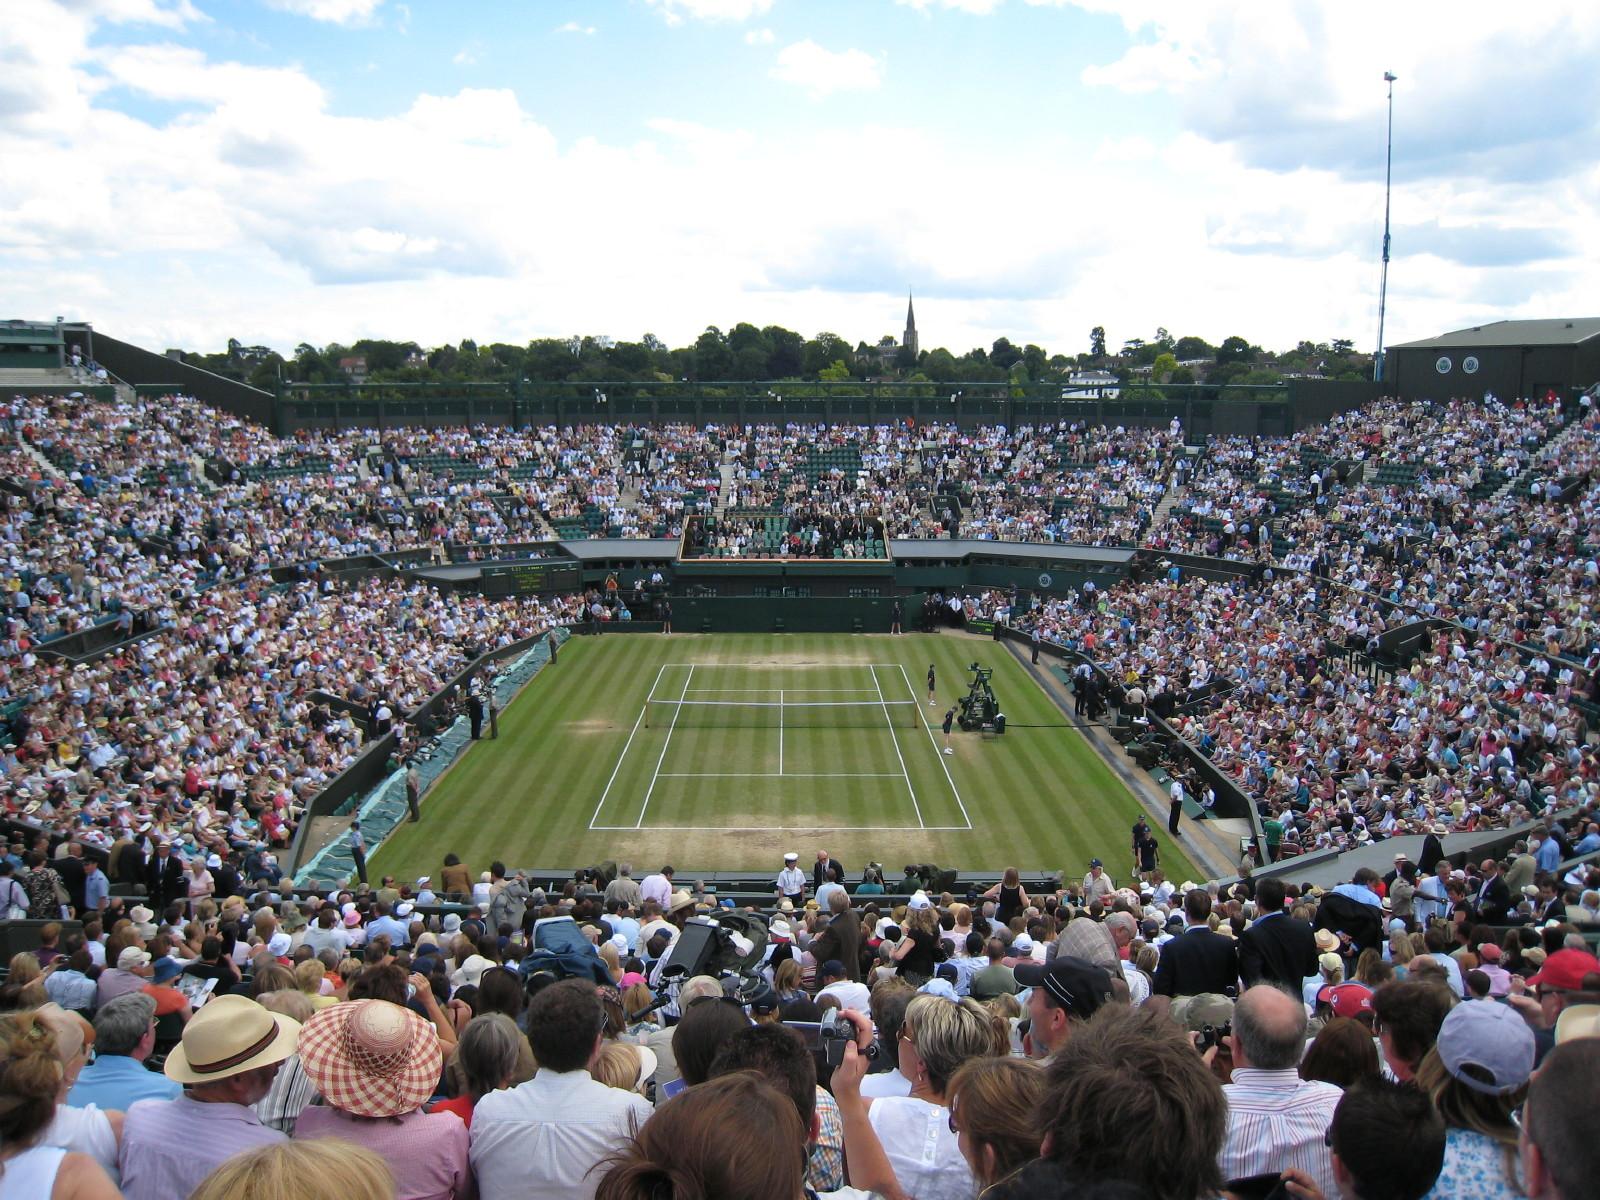 Wimbledon - Where is wimbledon